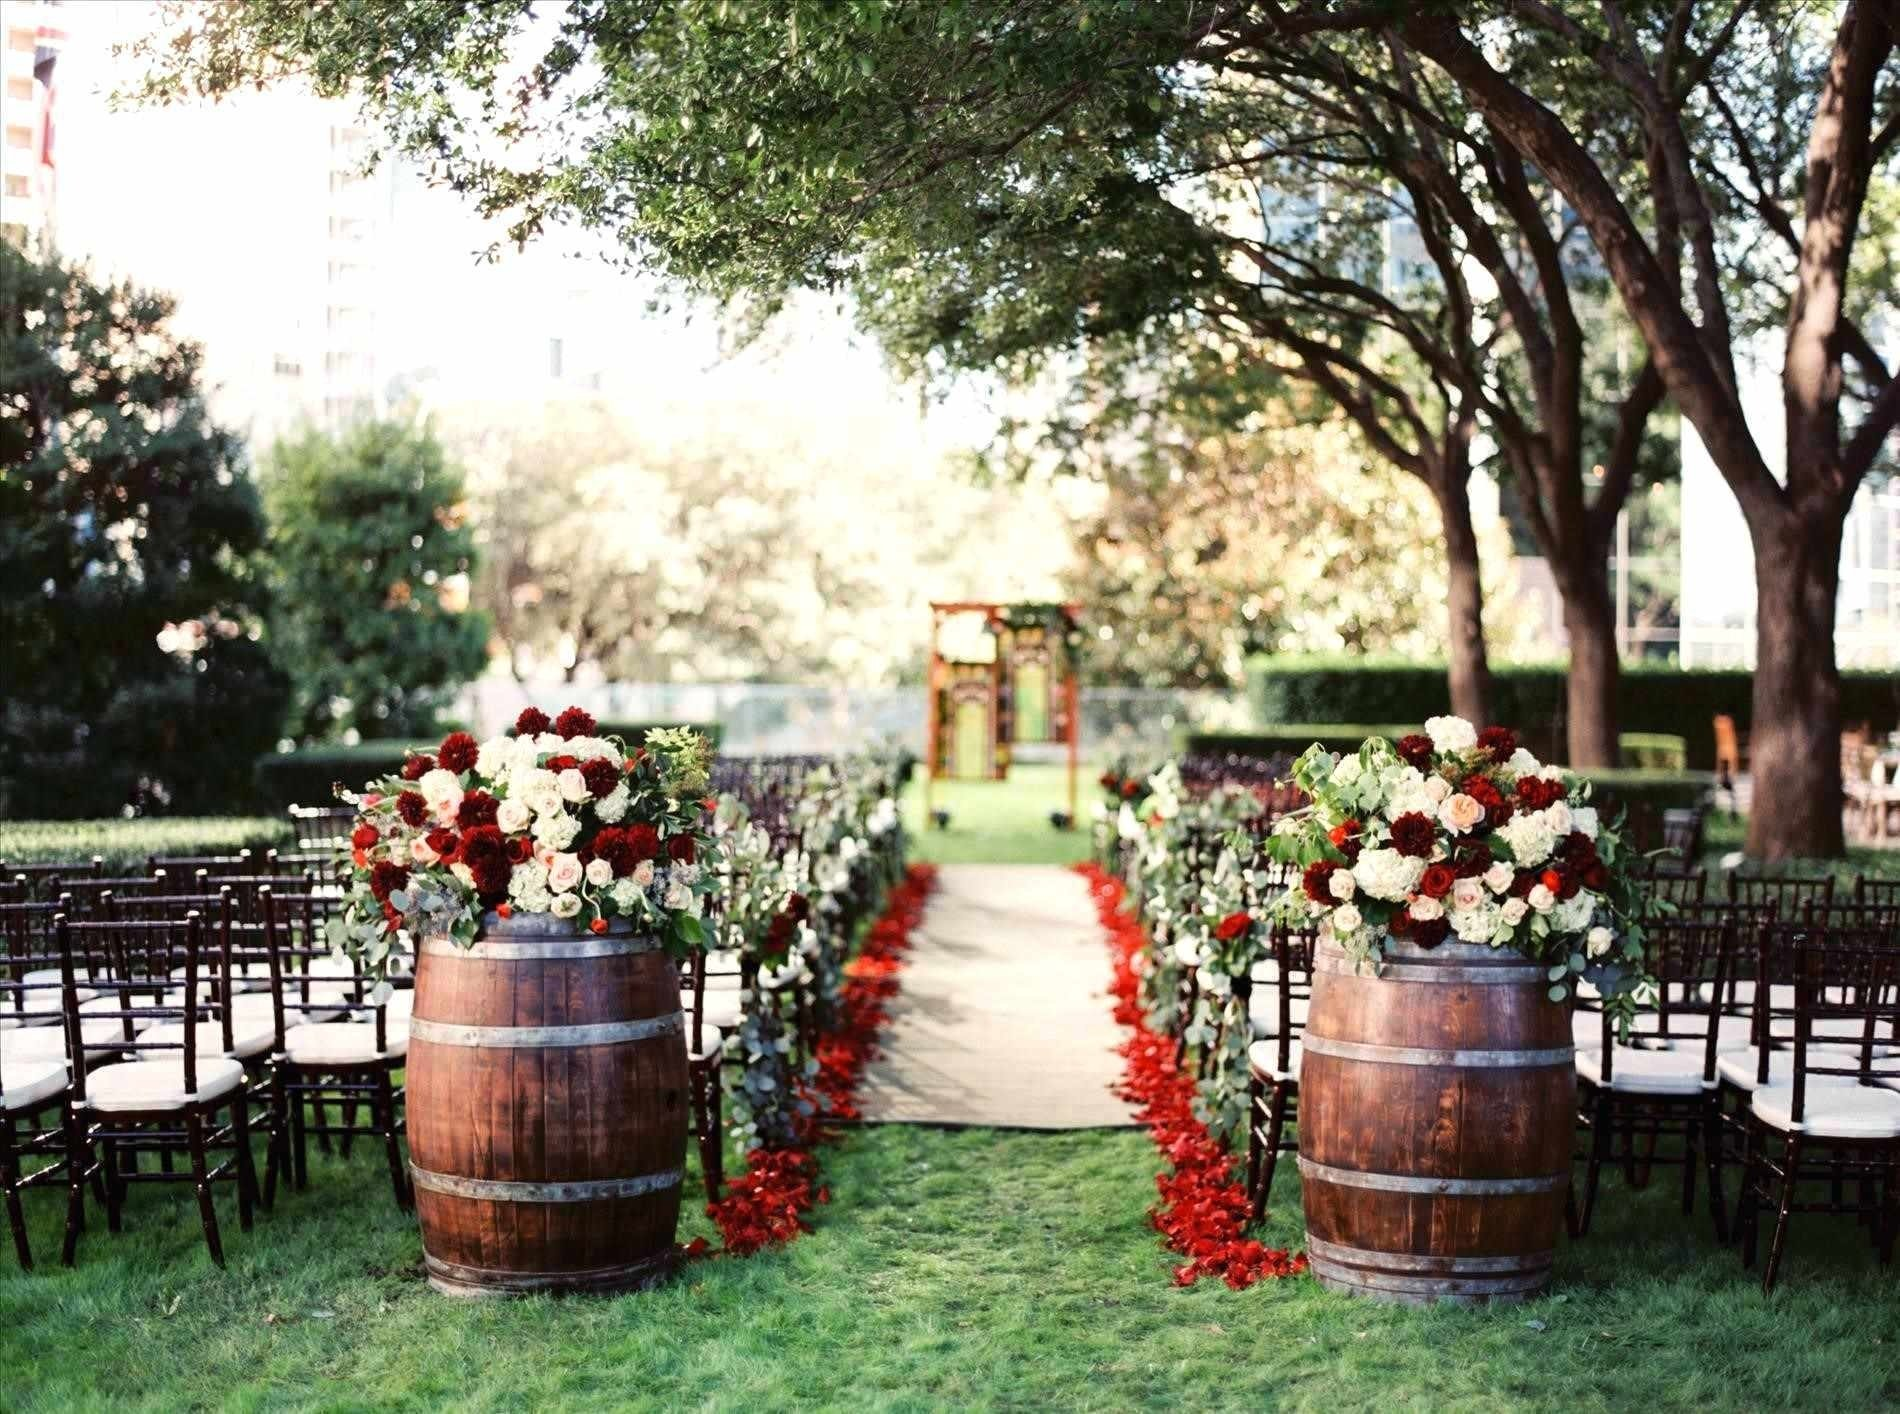 10 Cute Backyard Wedding Ideas For Summer fascinating backyard wedding ideas cheap for summer pics of concept